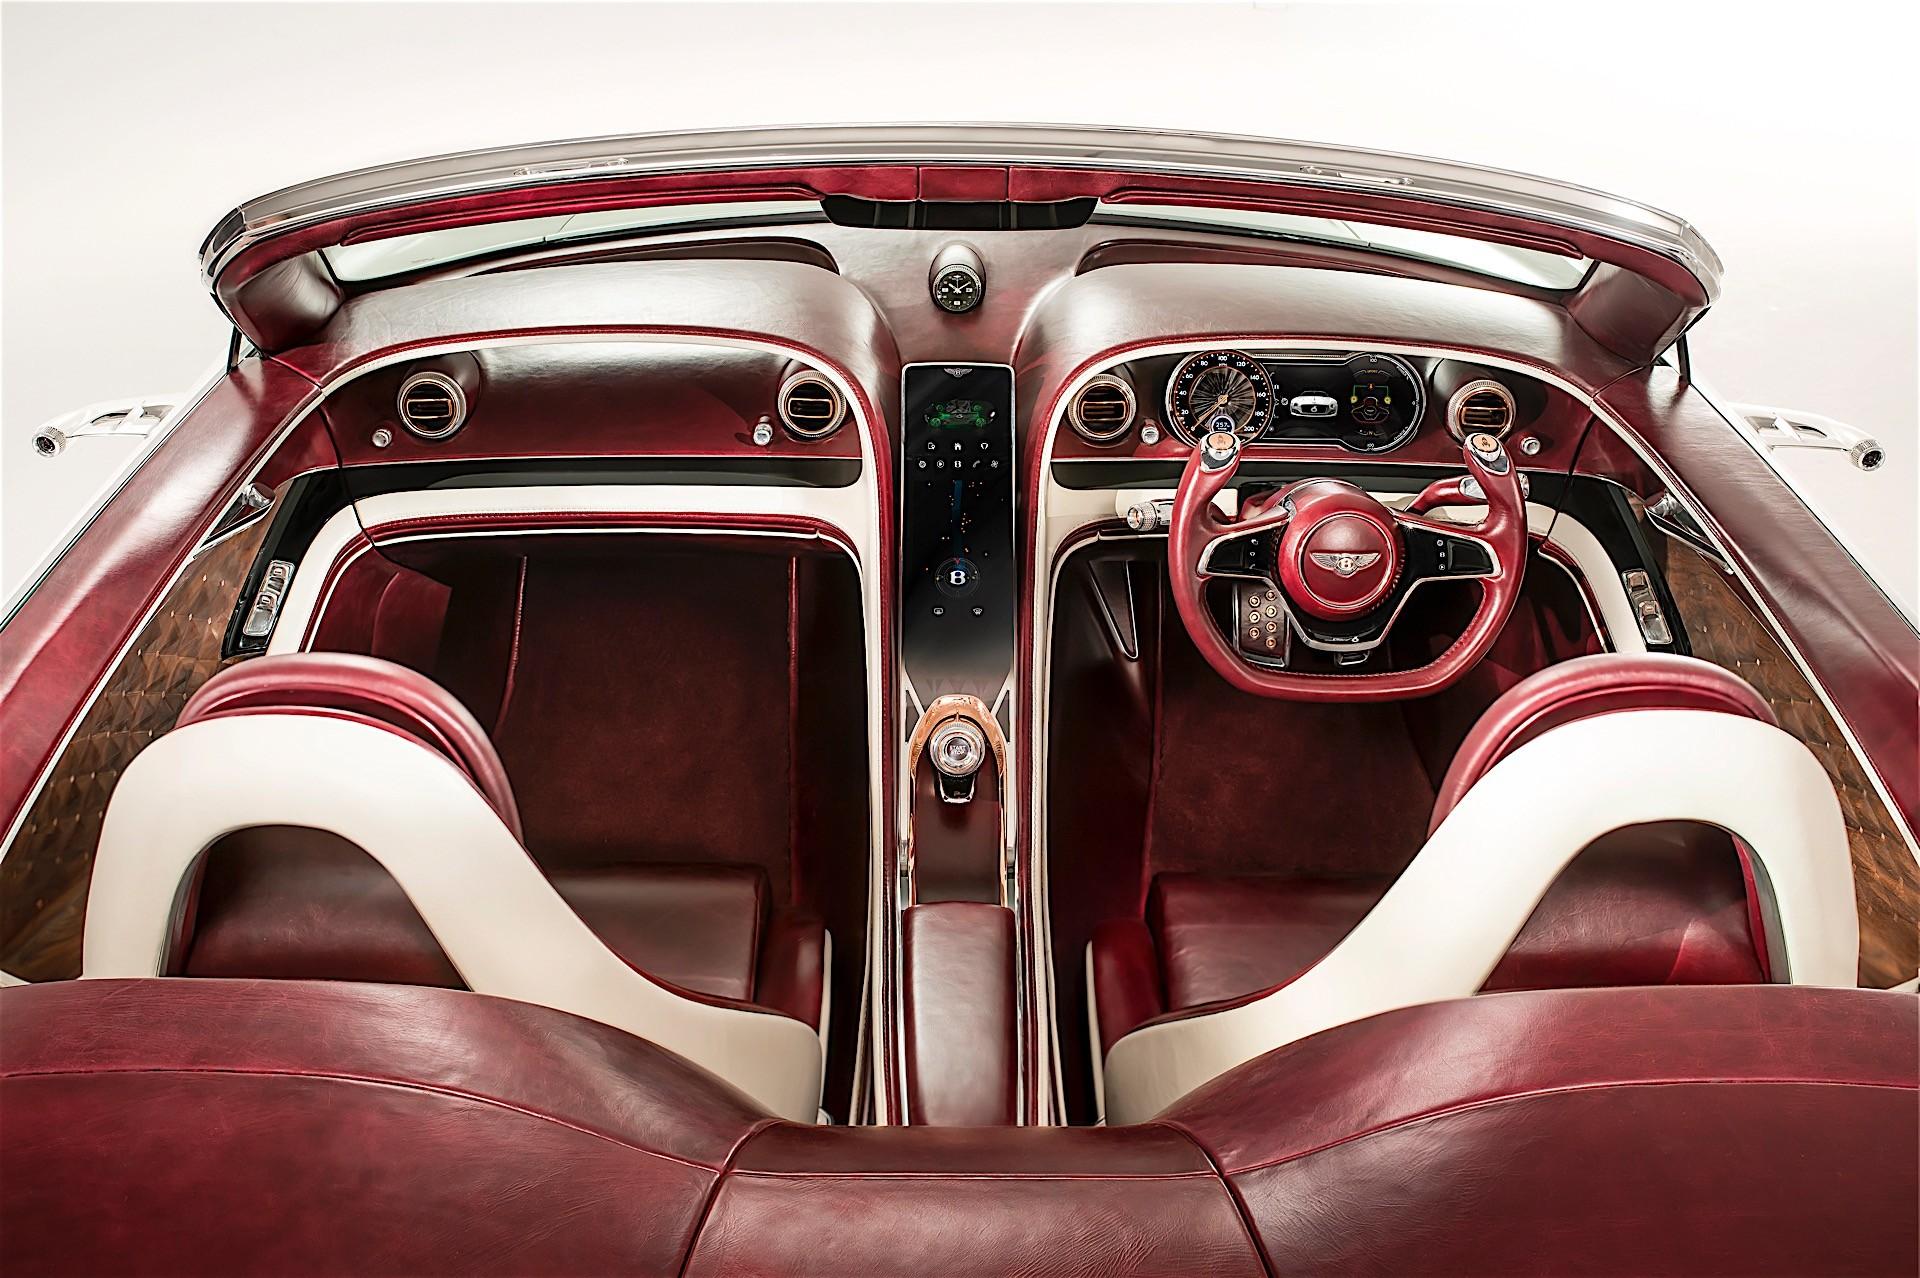 Bentley-gui-thong-diep-moi-voi-xe-dien-anh-4